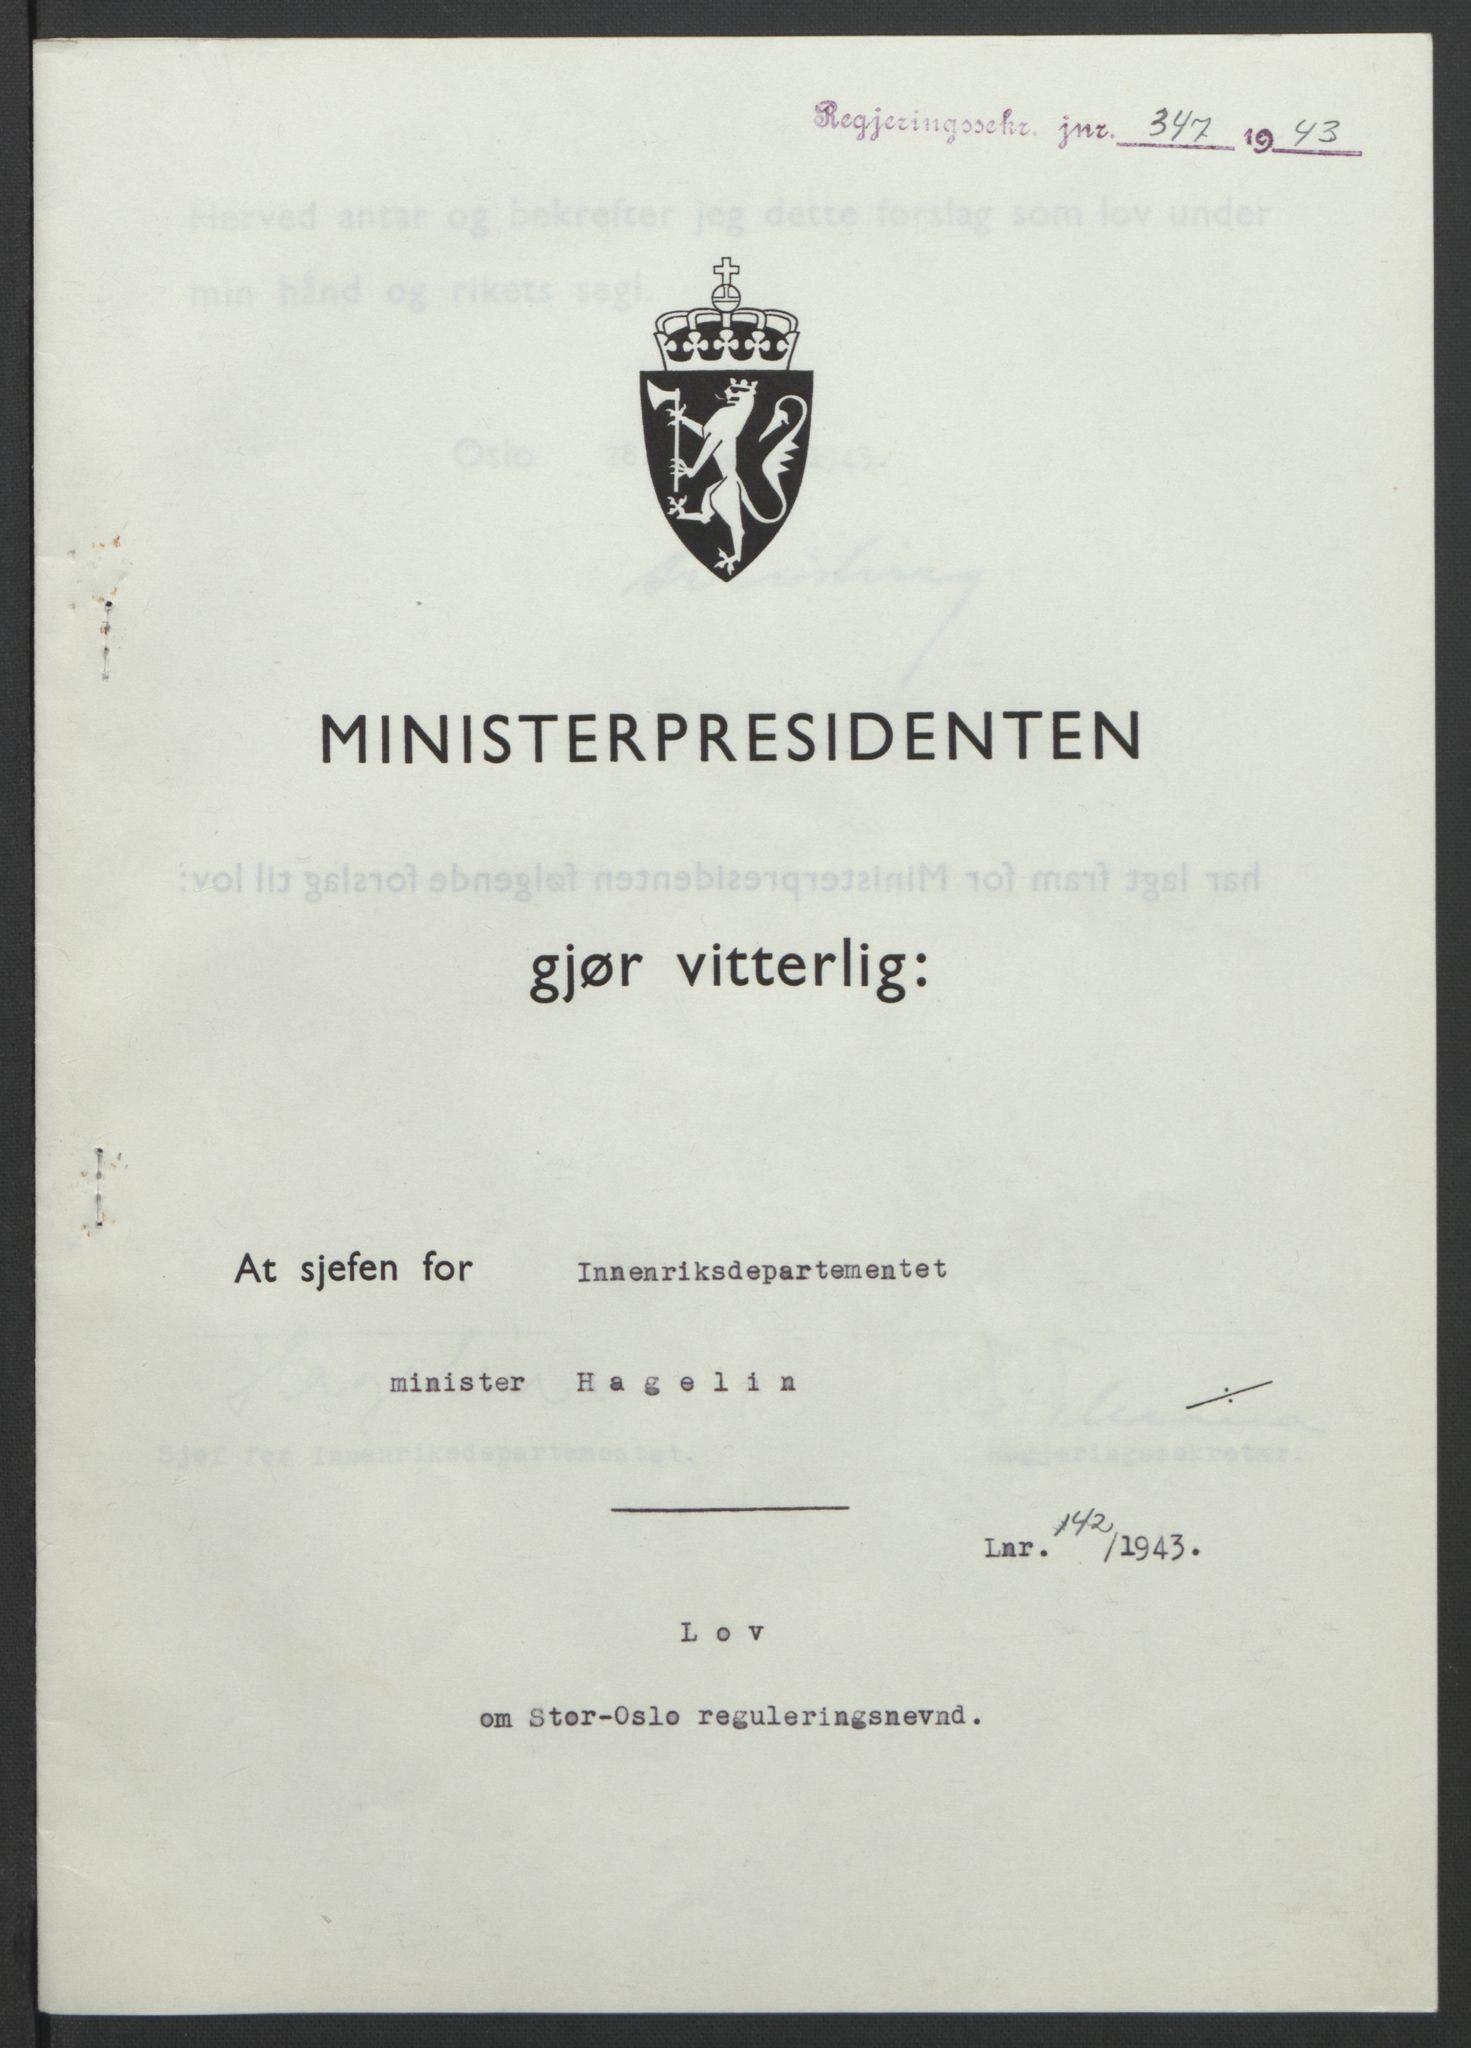 RA, NS-administrasjonen 1940-1945 (Statsrådsekretariatet, de kommisariske statsråder mm), D/Db/L0099: Lover, 1943, s. 661